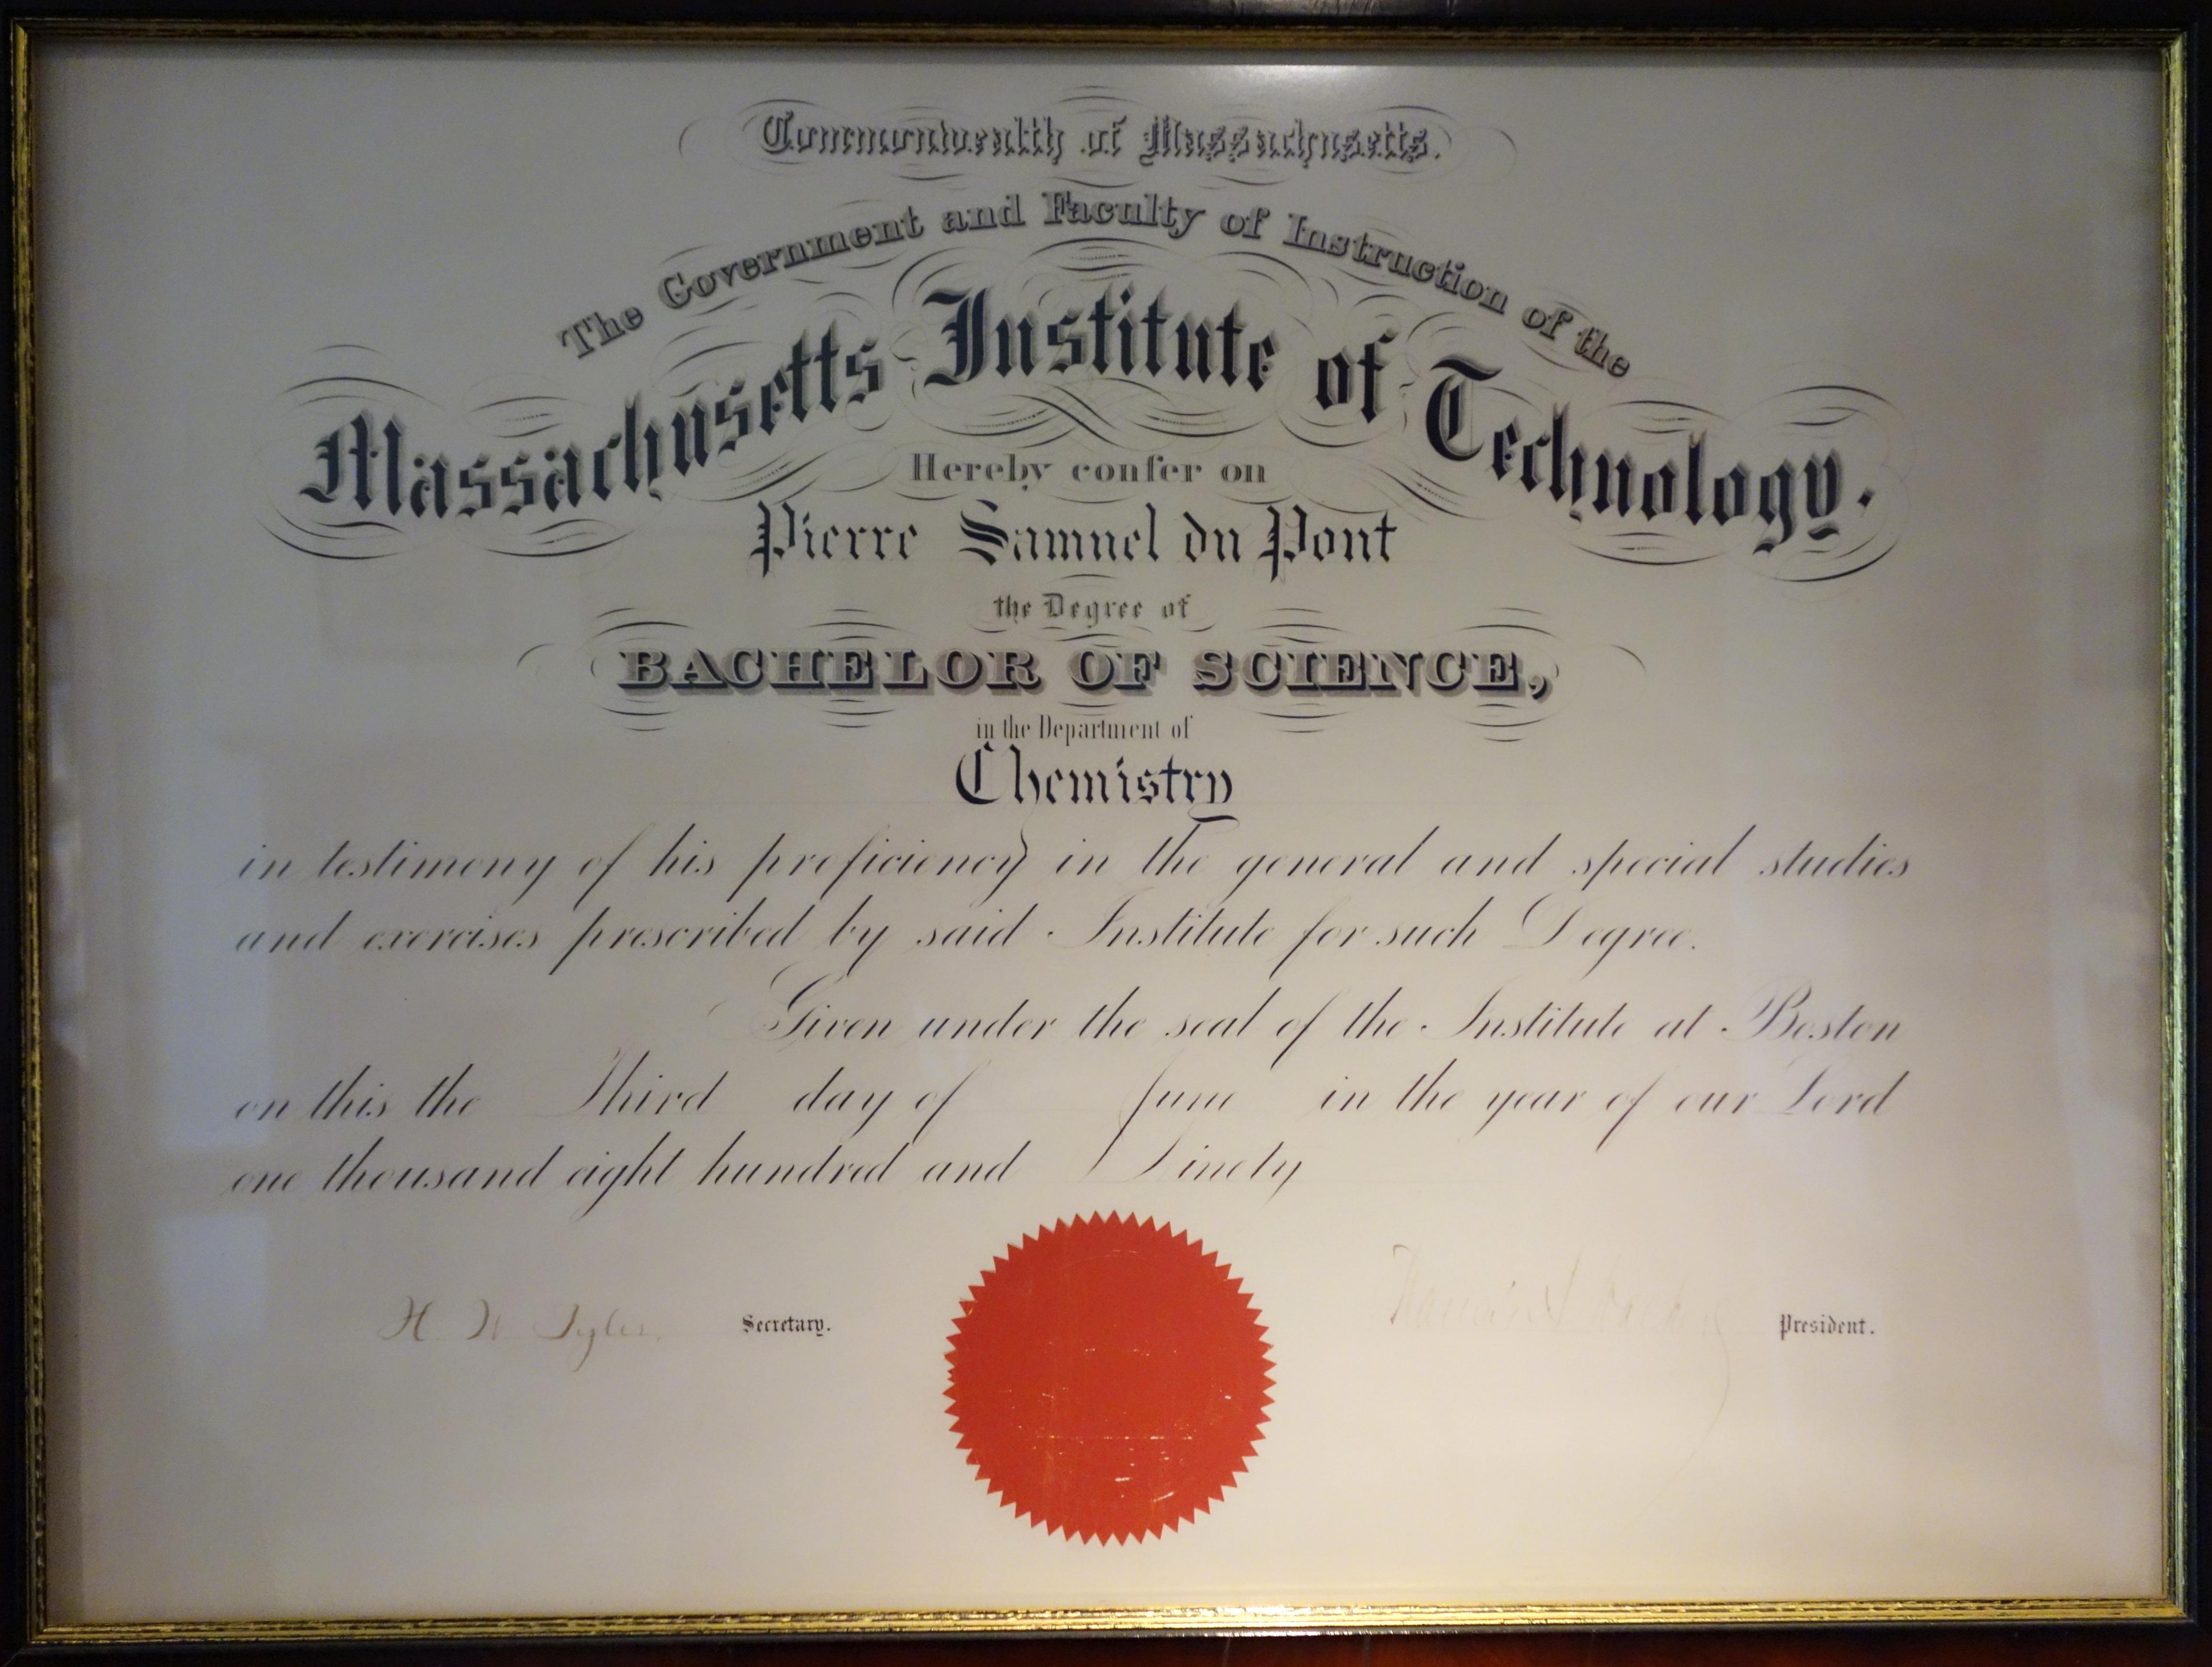 File:Pierre Samuel du Pont MIT Bachelor of Science degree in